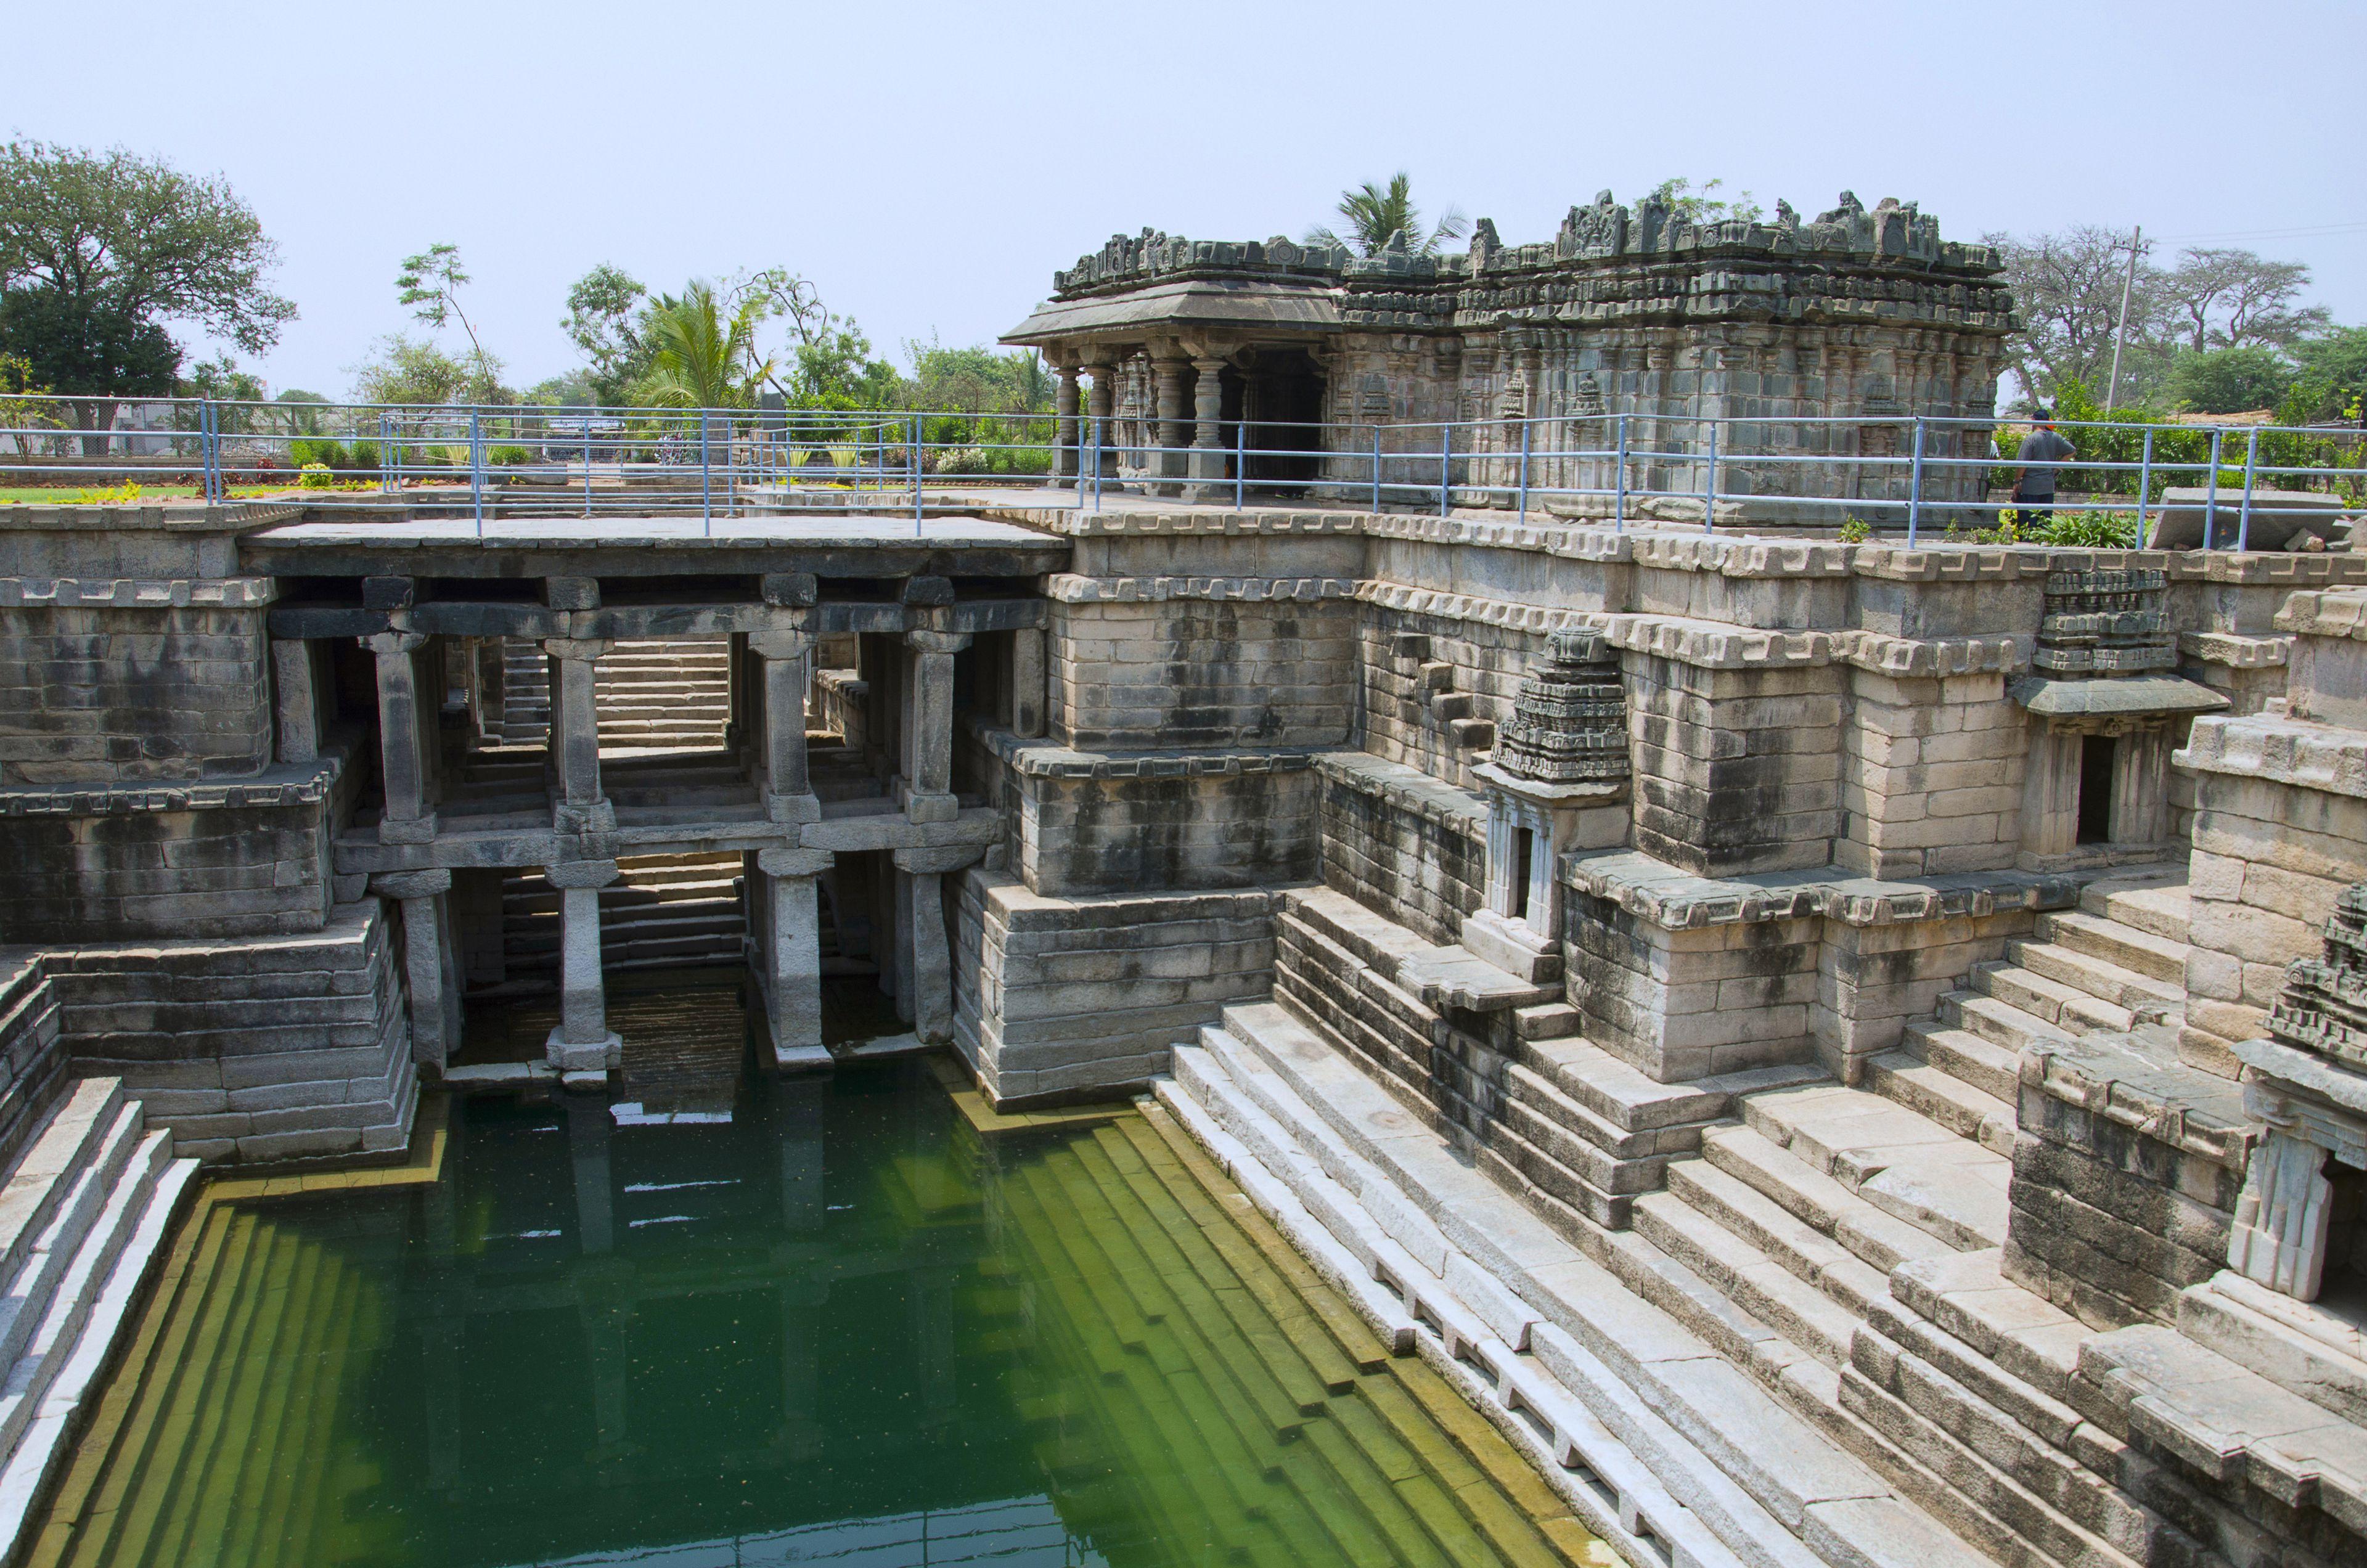 Muskin Bhanvi, Near Manikesvara Temple, Lakkundi, Karnataka, India